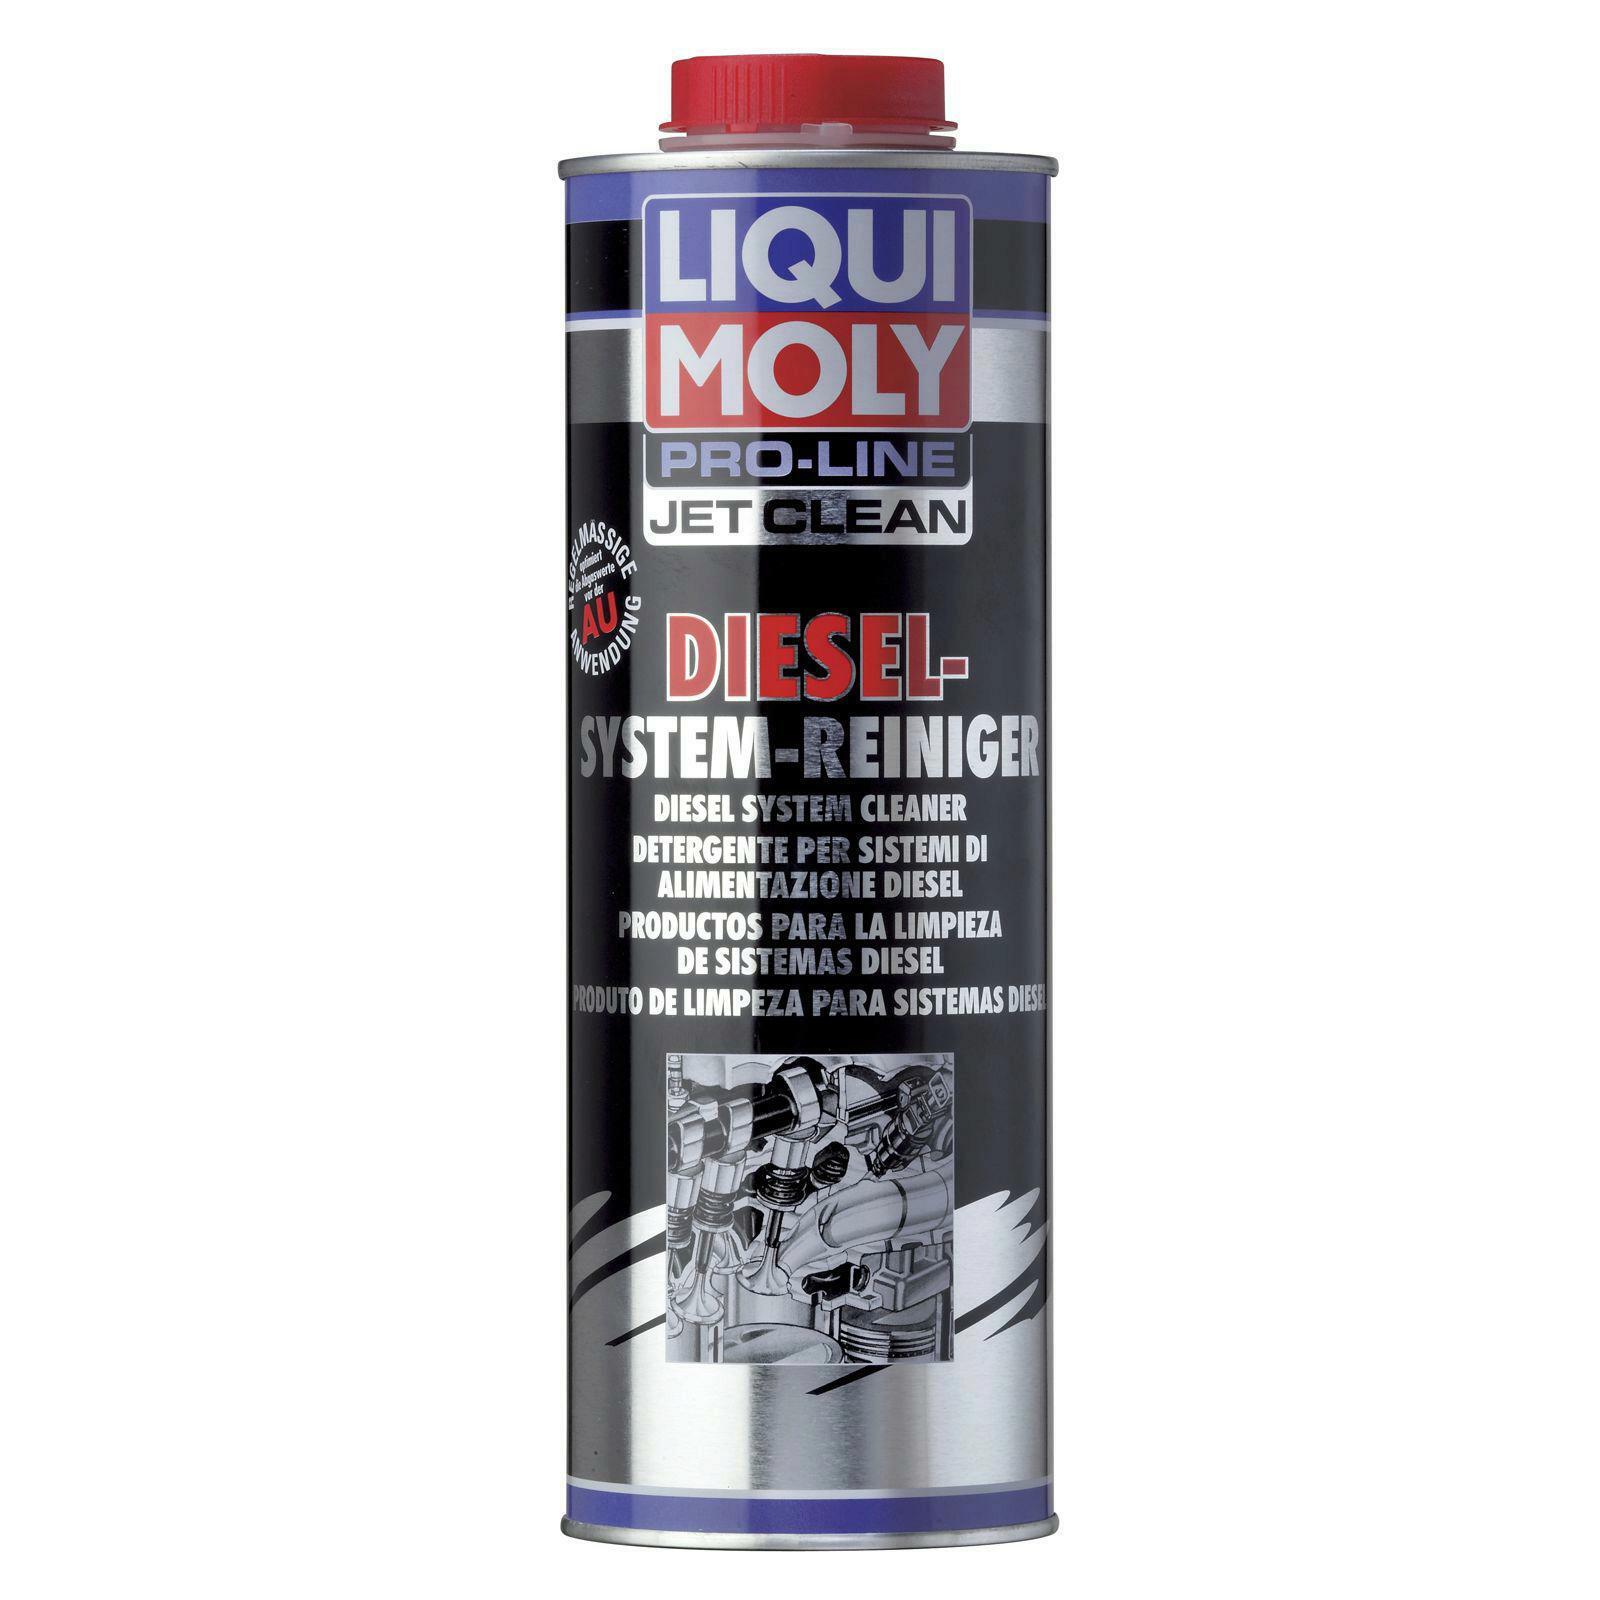 Liqui Moly Pro-Line JetClean Diesel-System-Reiniger 1l